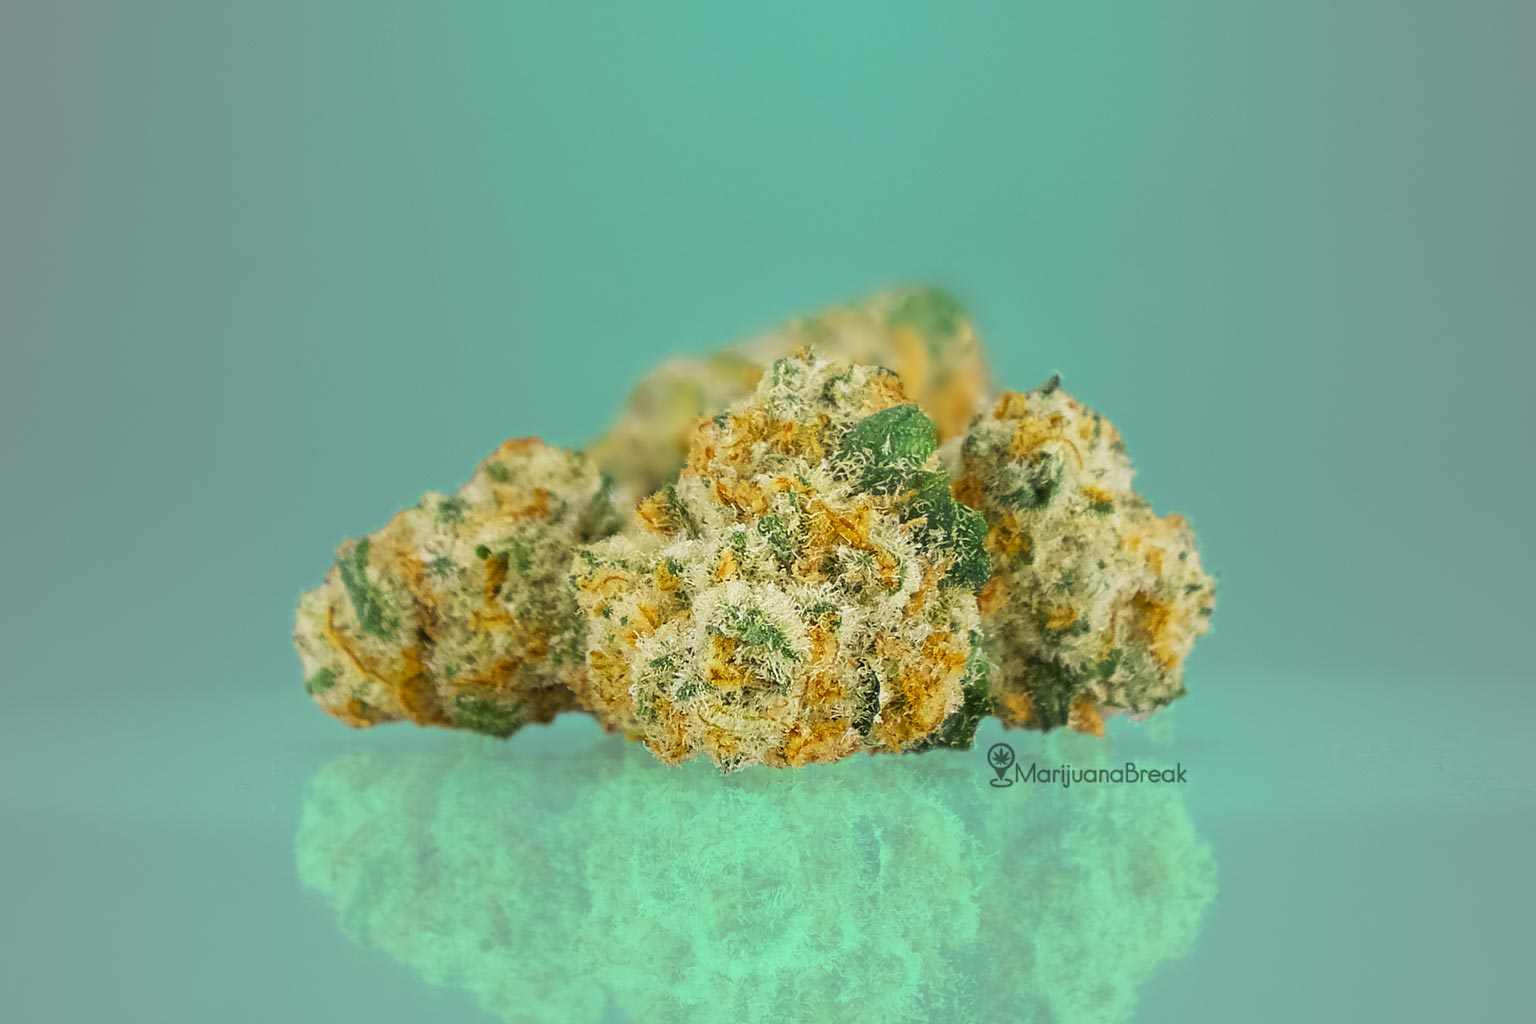 Cannatonic Cannabis Strain